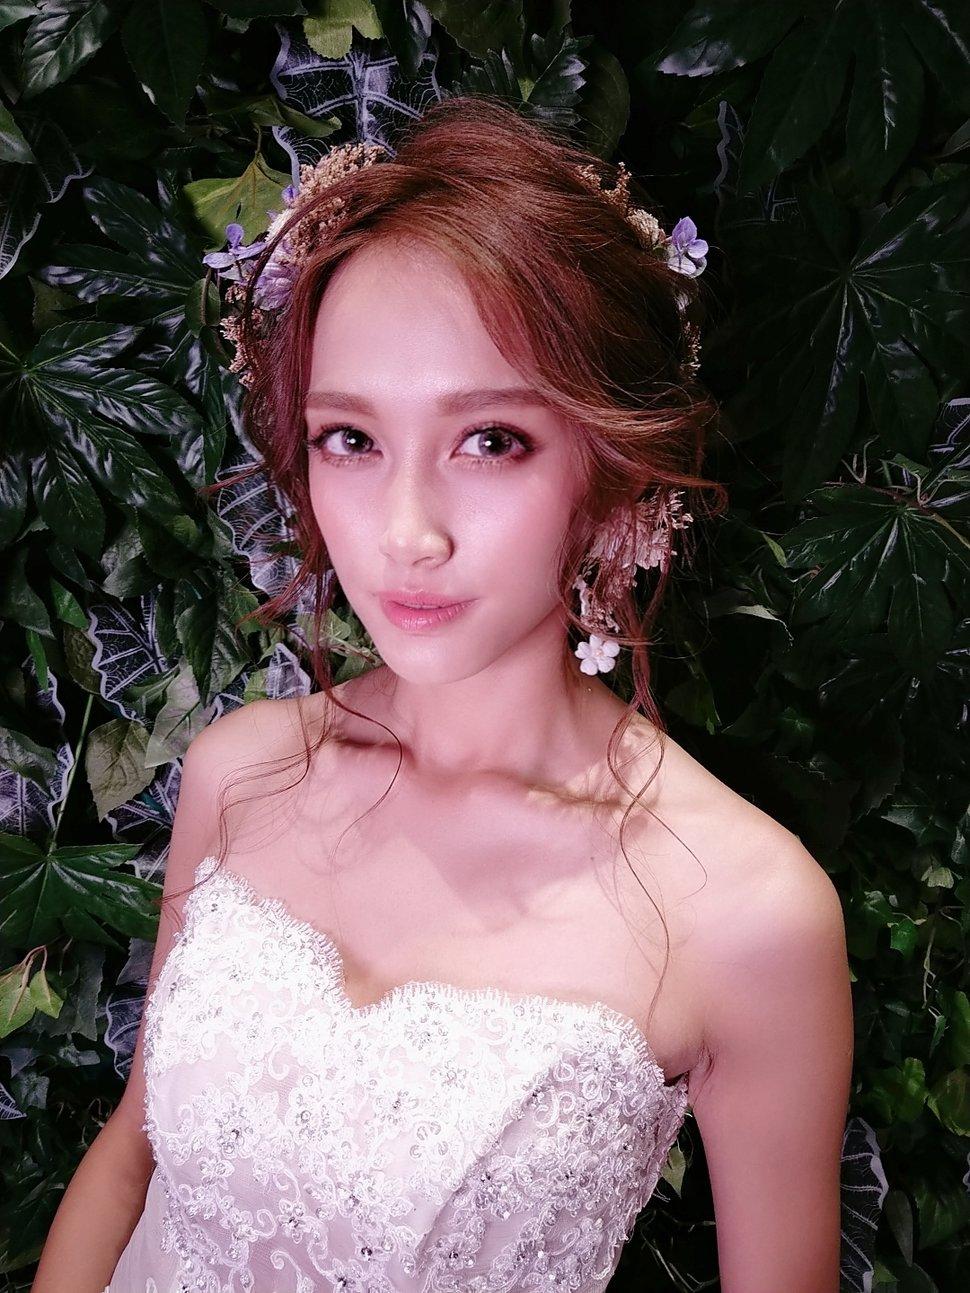 O2Cam_20190810144133_mh1565439121647 - Elaine makeup《結婚吧》